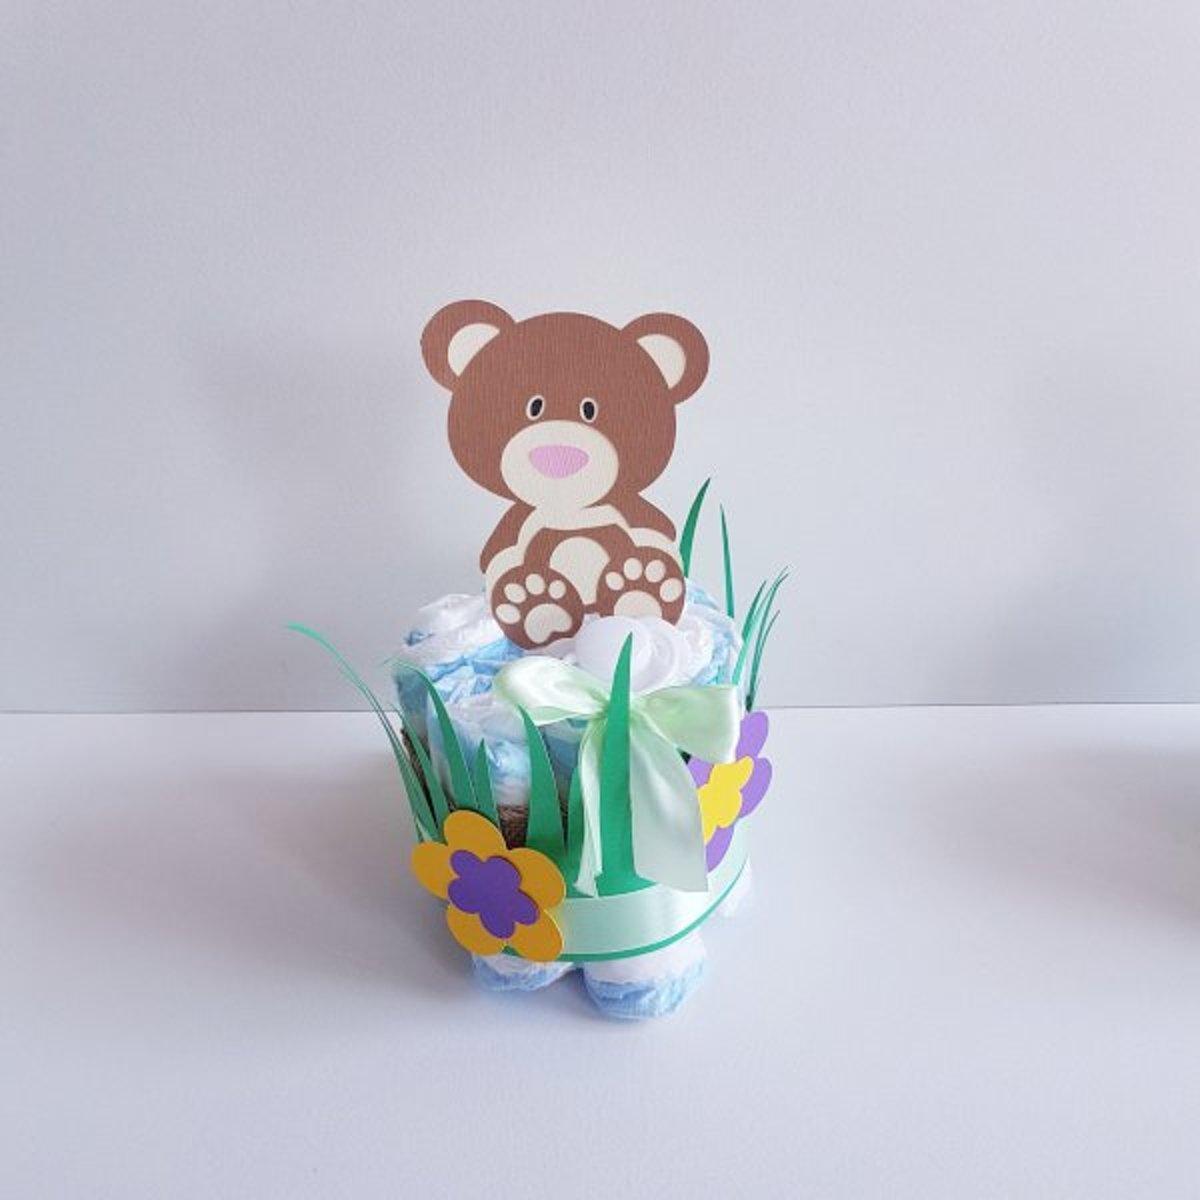 Luiertaart Babyshower Beertje | Kraamcadeau | Kraampakket | Baby Cadeau